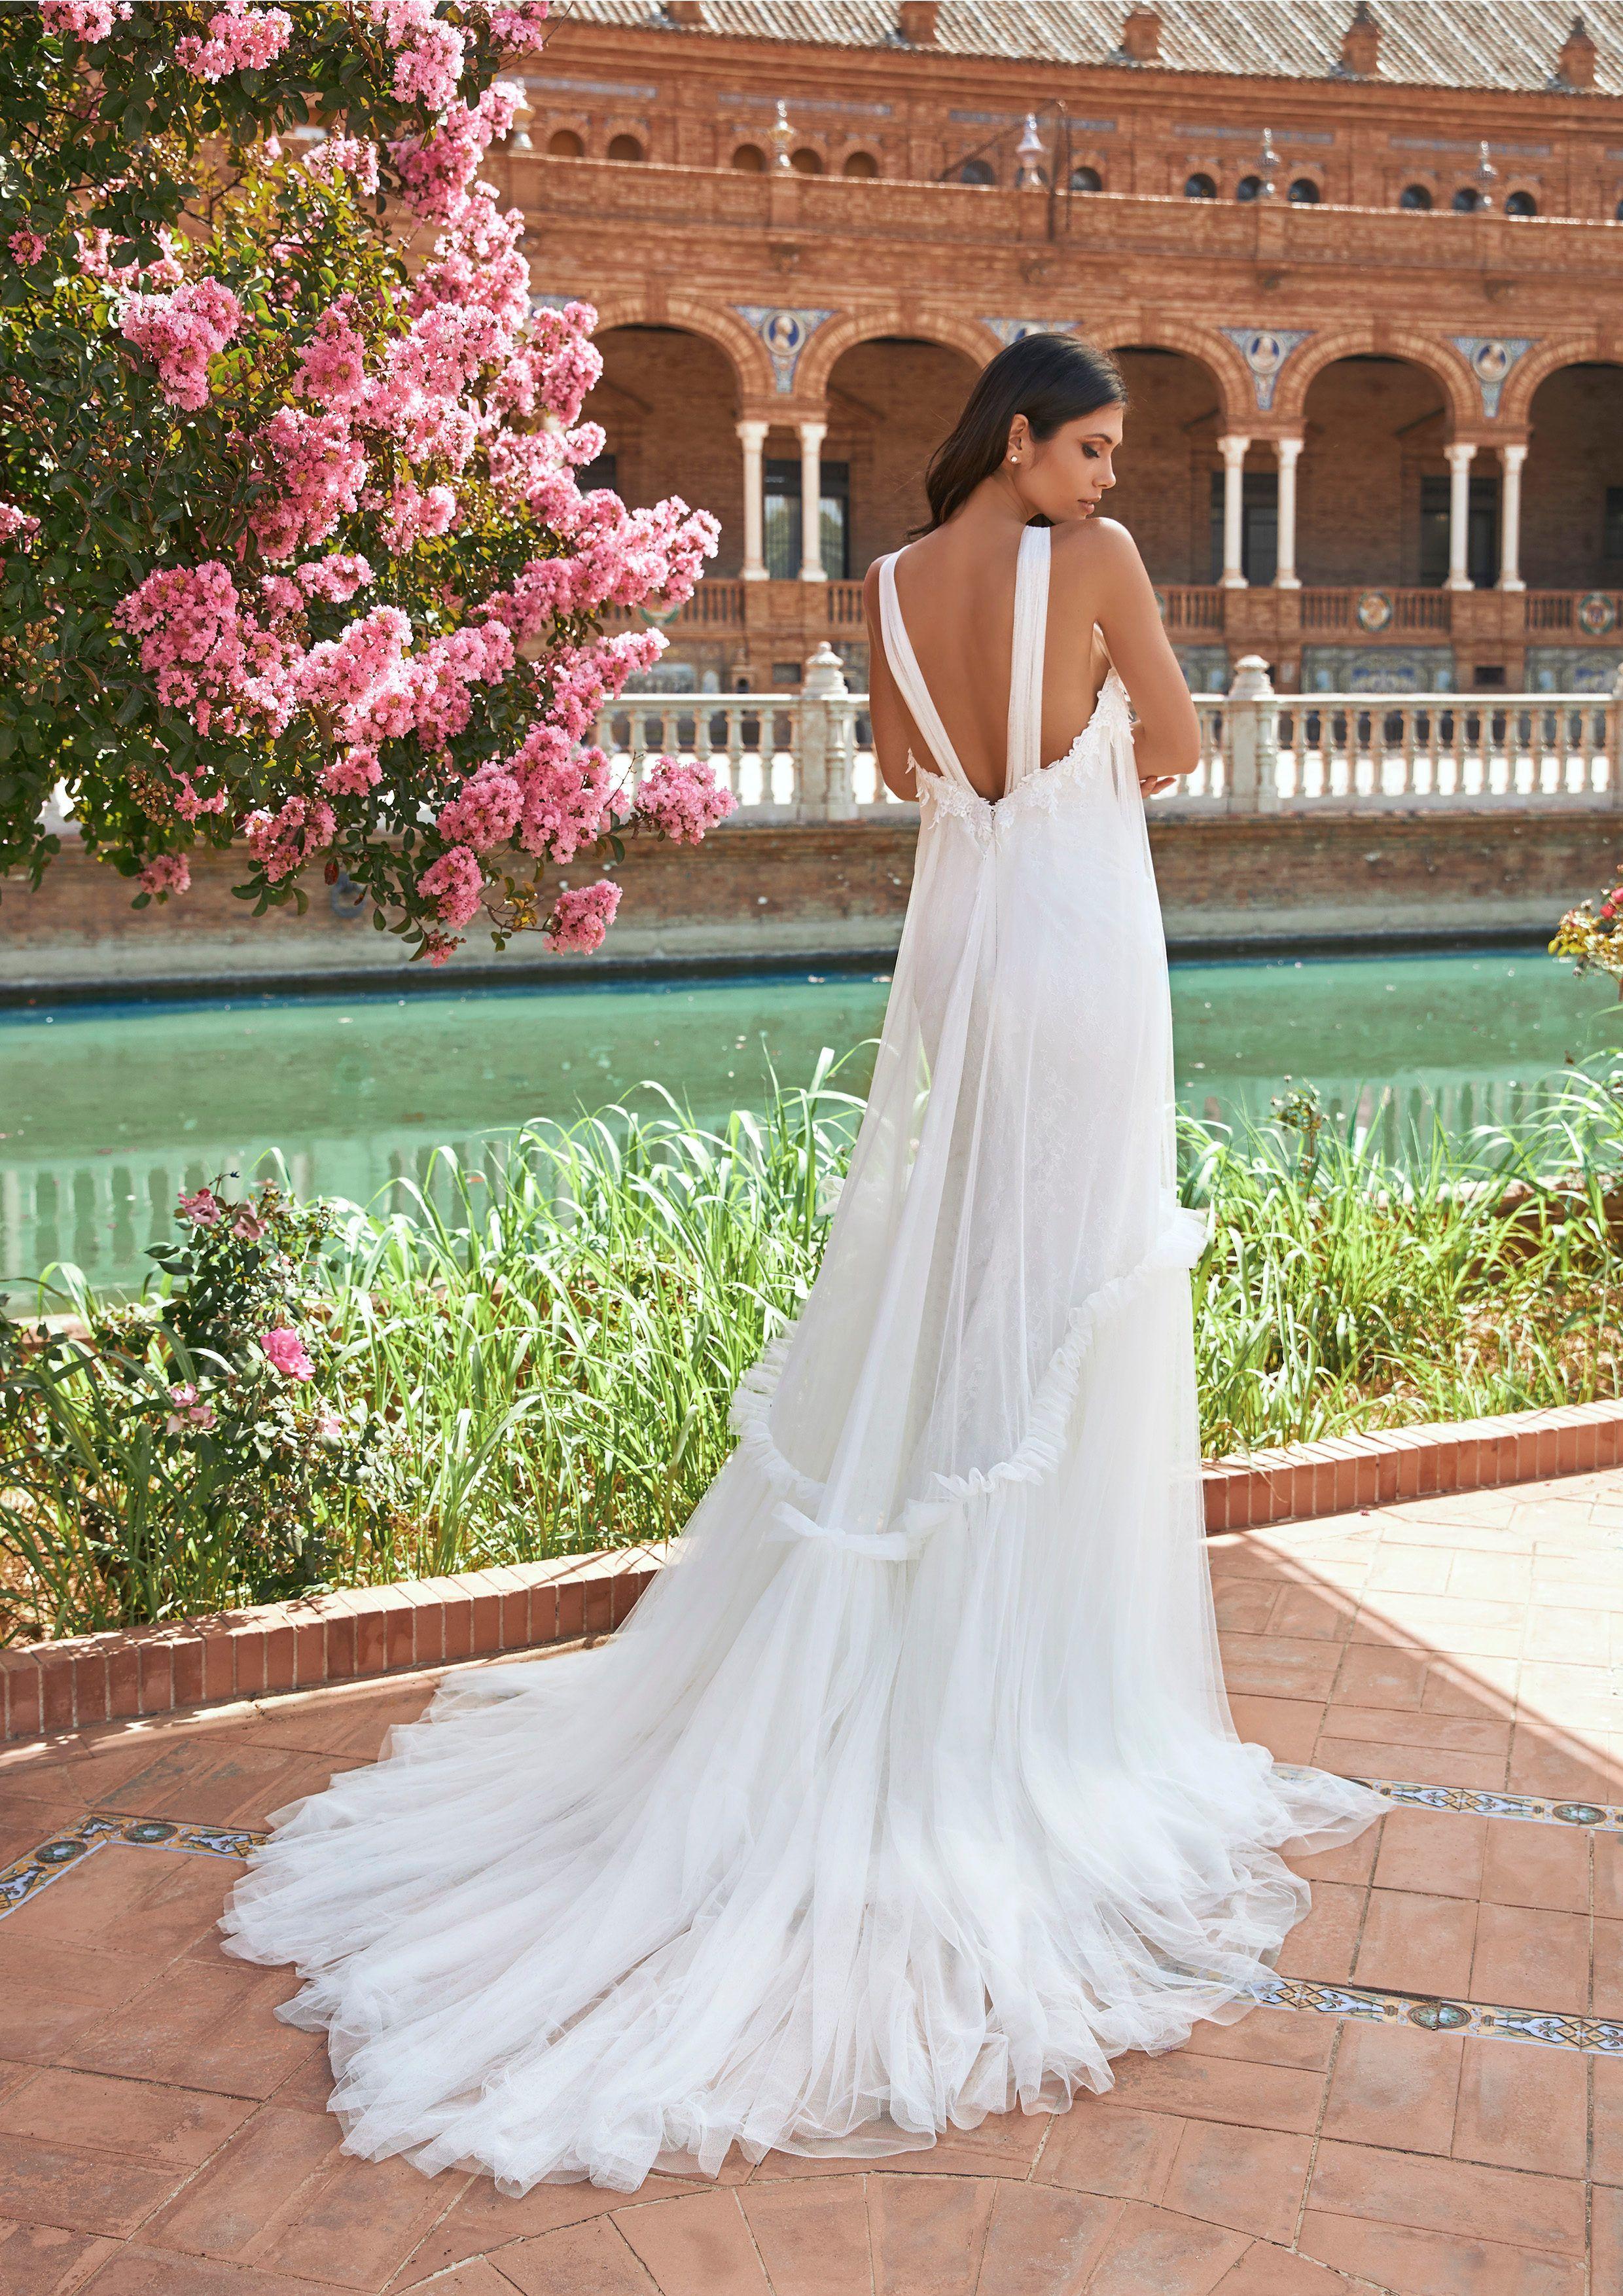 Mermaid Open Back Halter Wedding Dress With Lace Oropesse In 2021 Greek Wedding Dresses Wedding Dresses Wedding Dresses Lace [ 3508 x 2480 Pixel ]